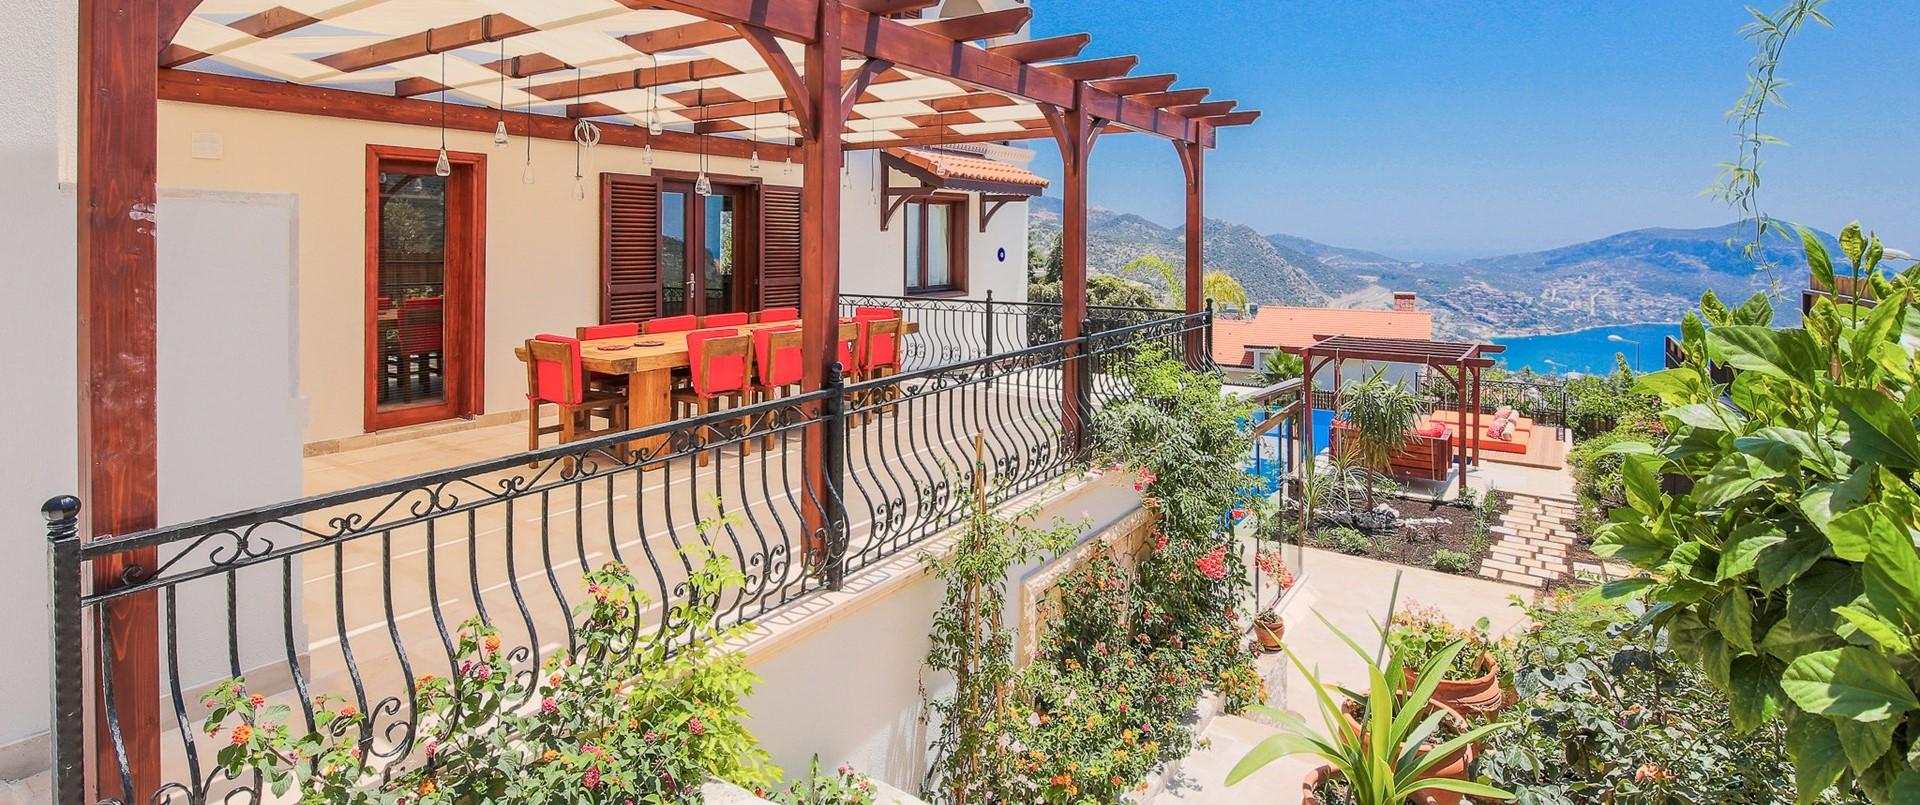 villa-caria-kalkan-outdoor-dining-terrac